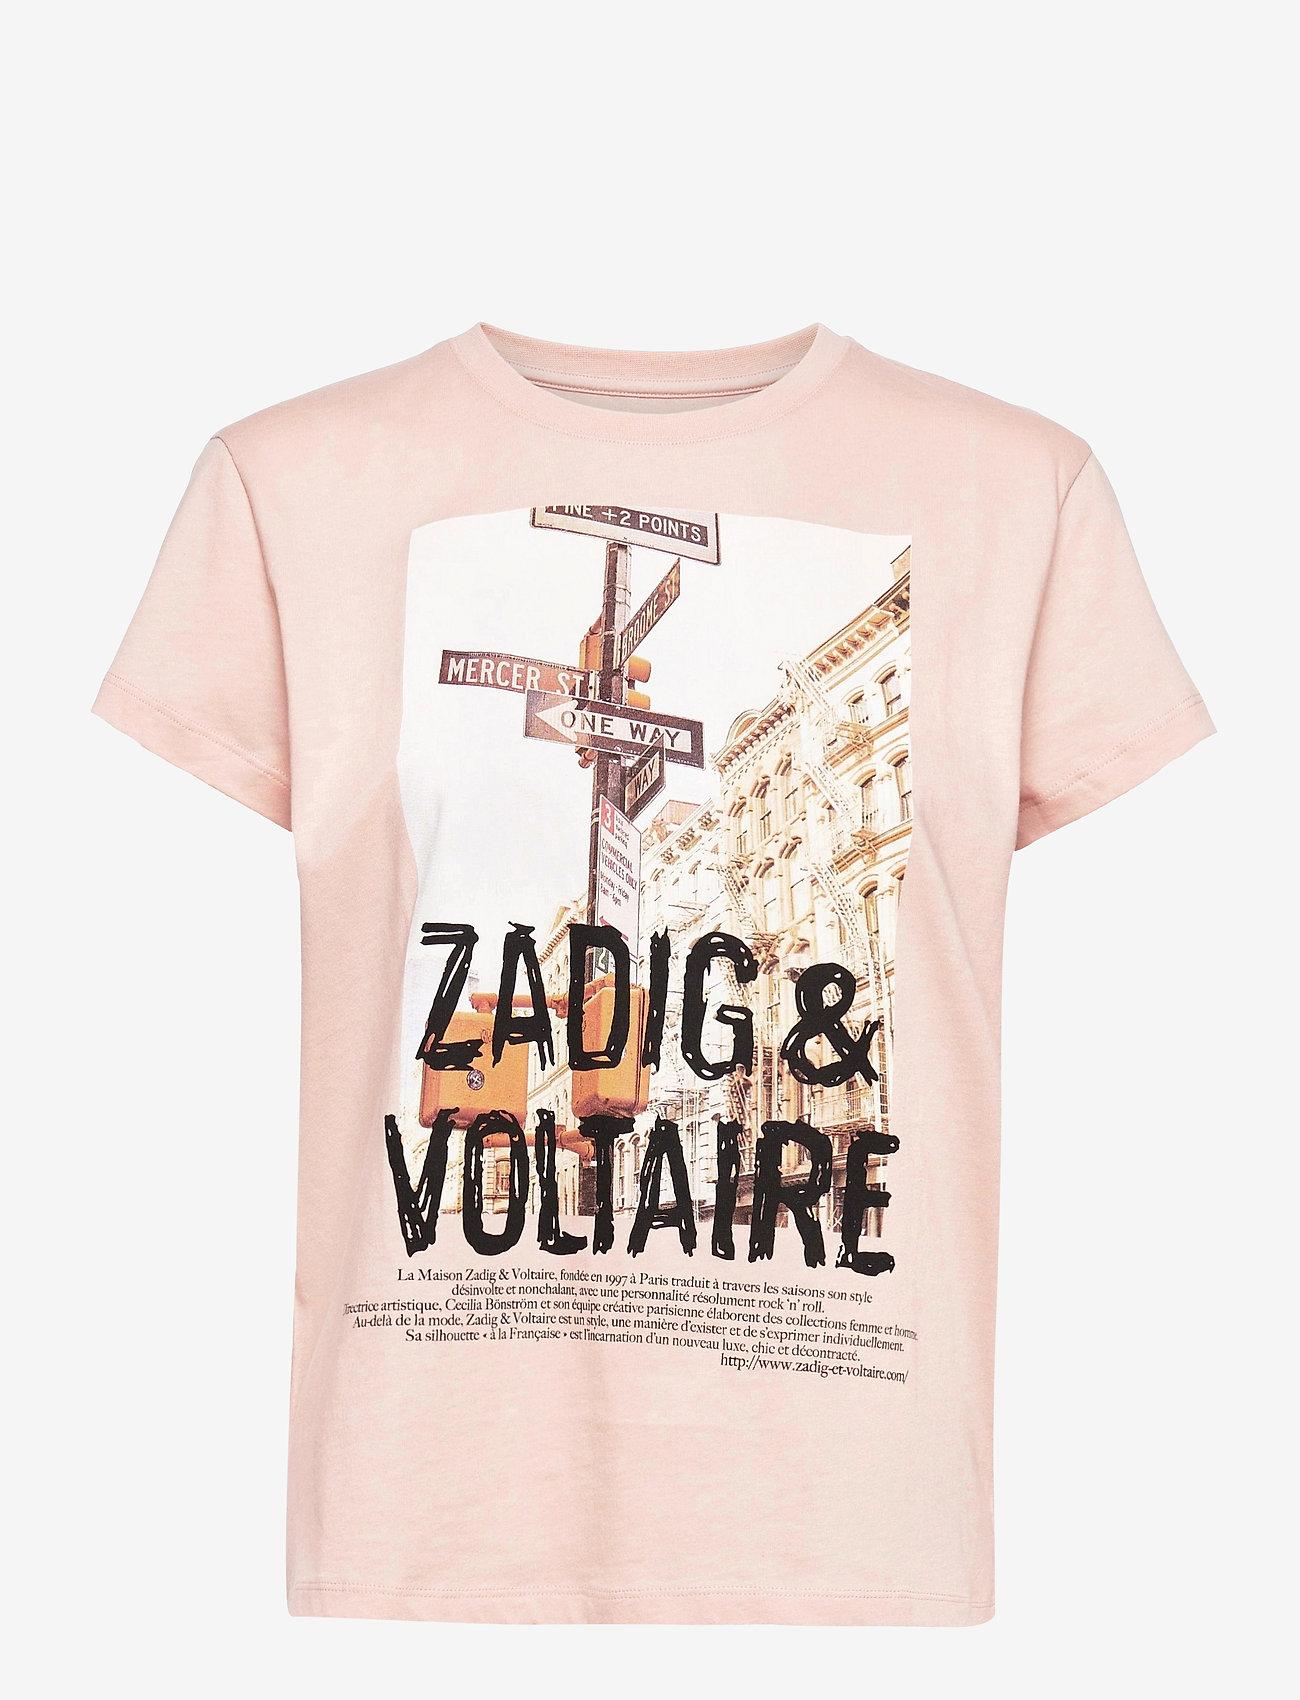 Zadig & Voltaire - ZOE PHOTOPRINT PRINTED T-SHIRT - t-shirts - skin - 1